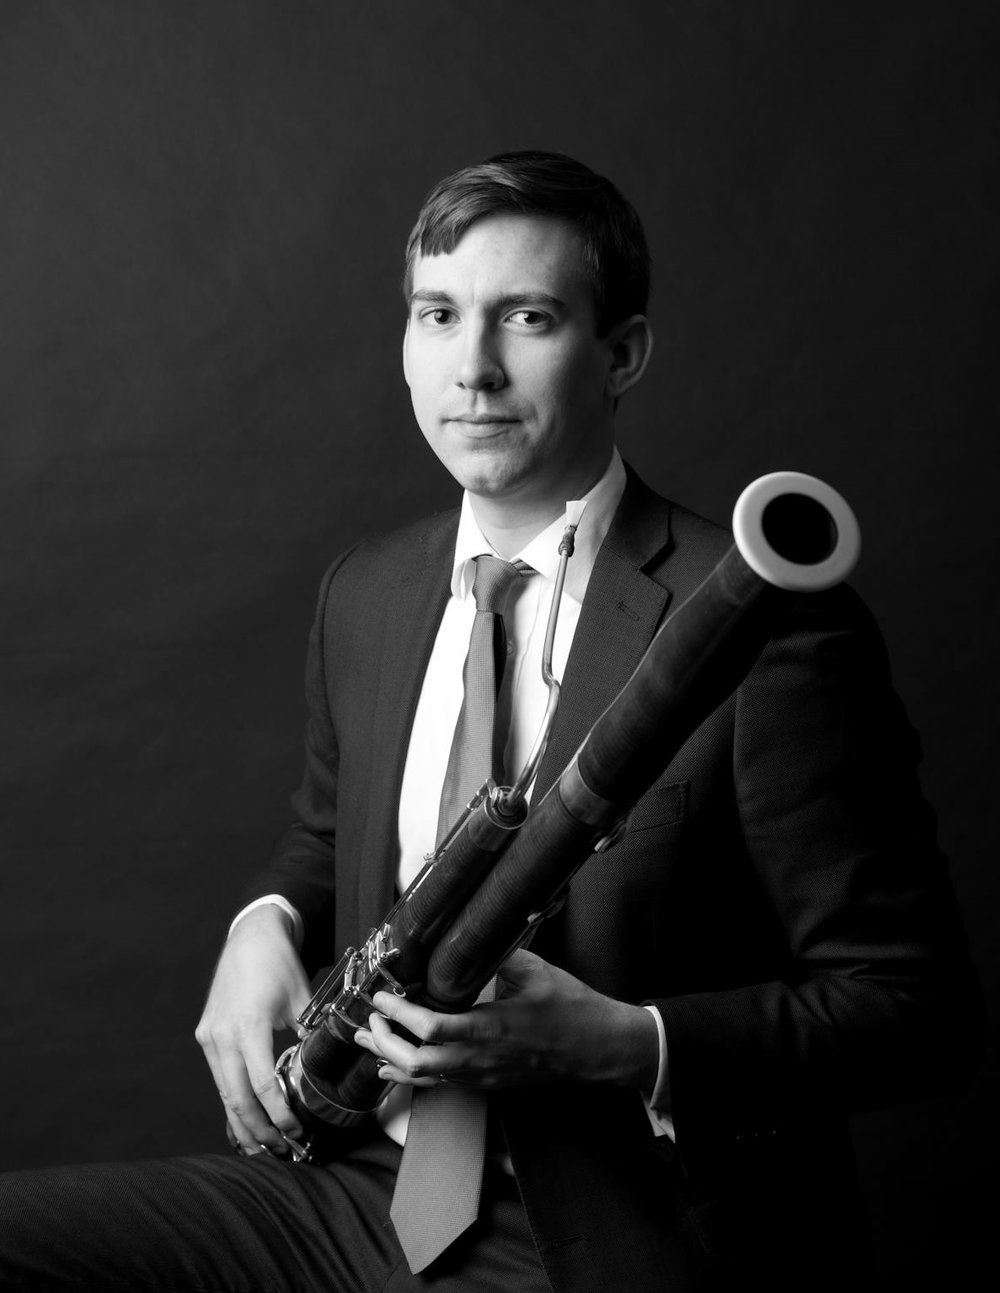 Joseph Grimmer - Principal Bassoon